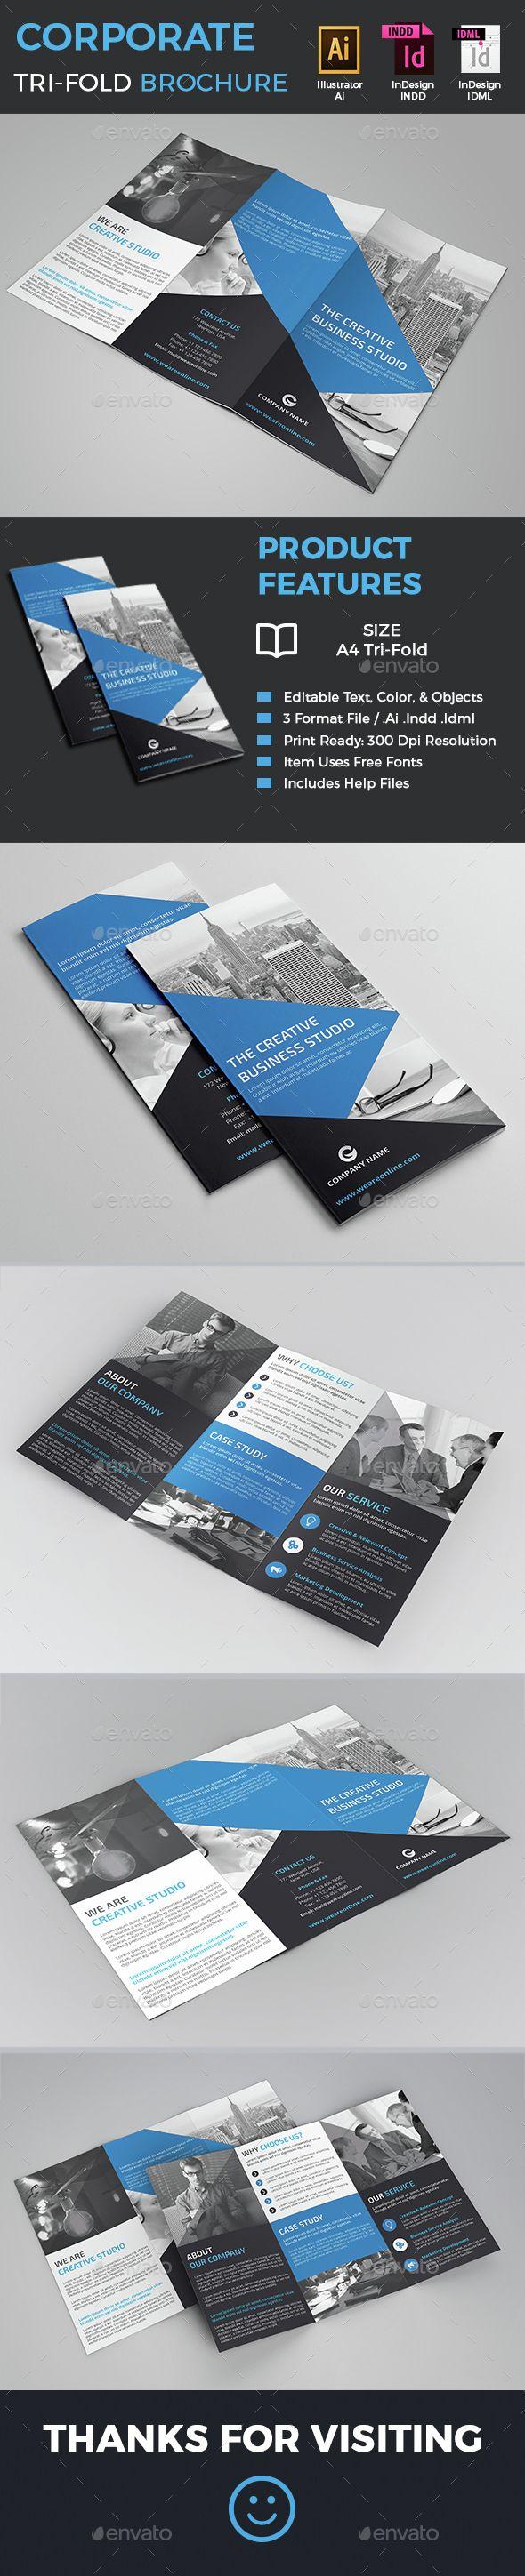 Corporate TriFold Brochure Tri Fold Brochure Tri Fold Brochure - Tri fold brochure template indesign free download